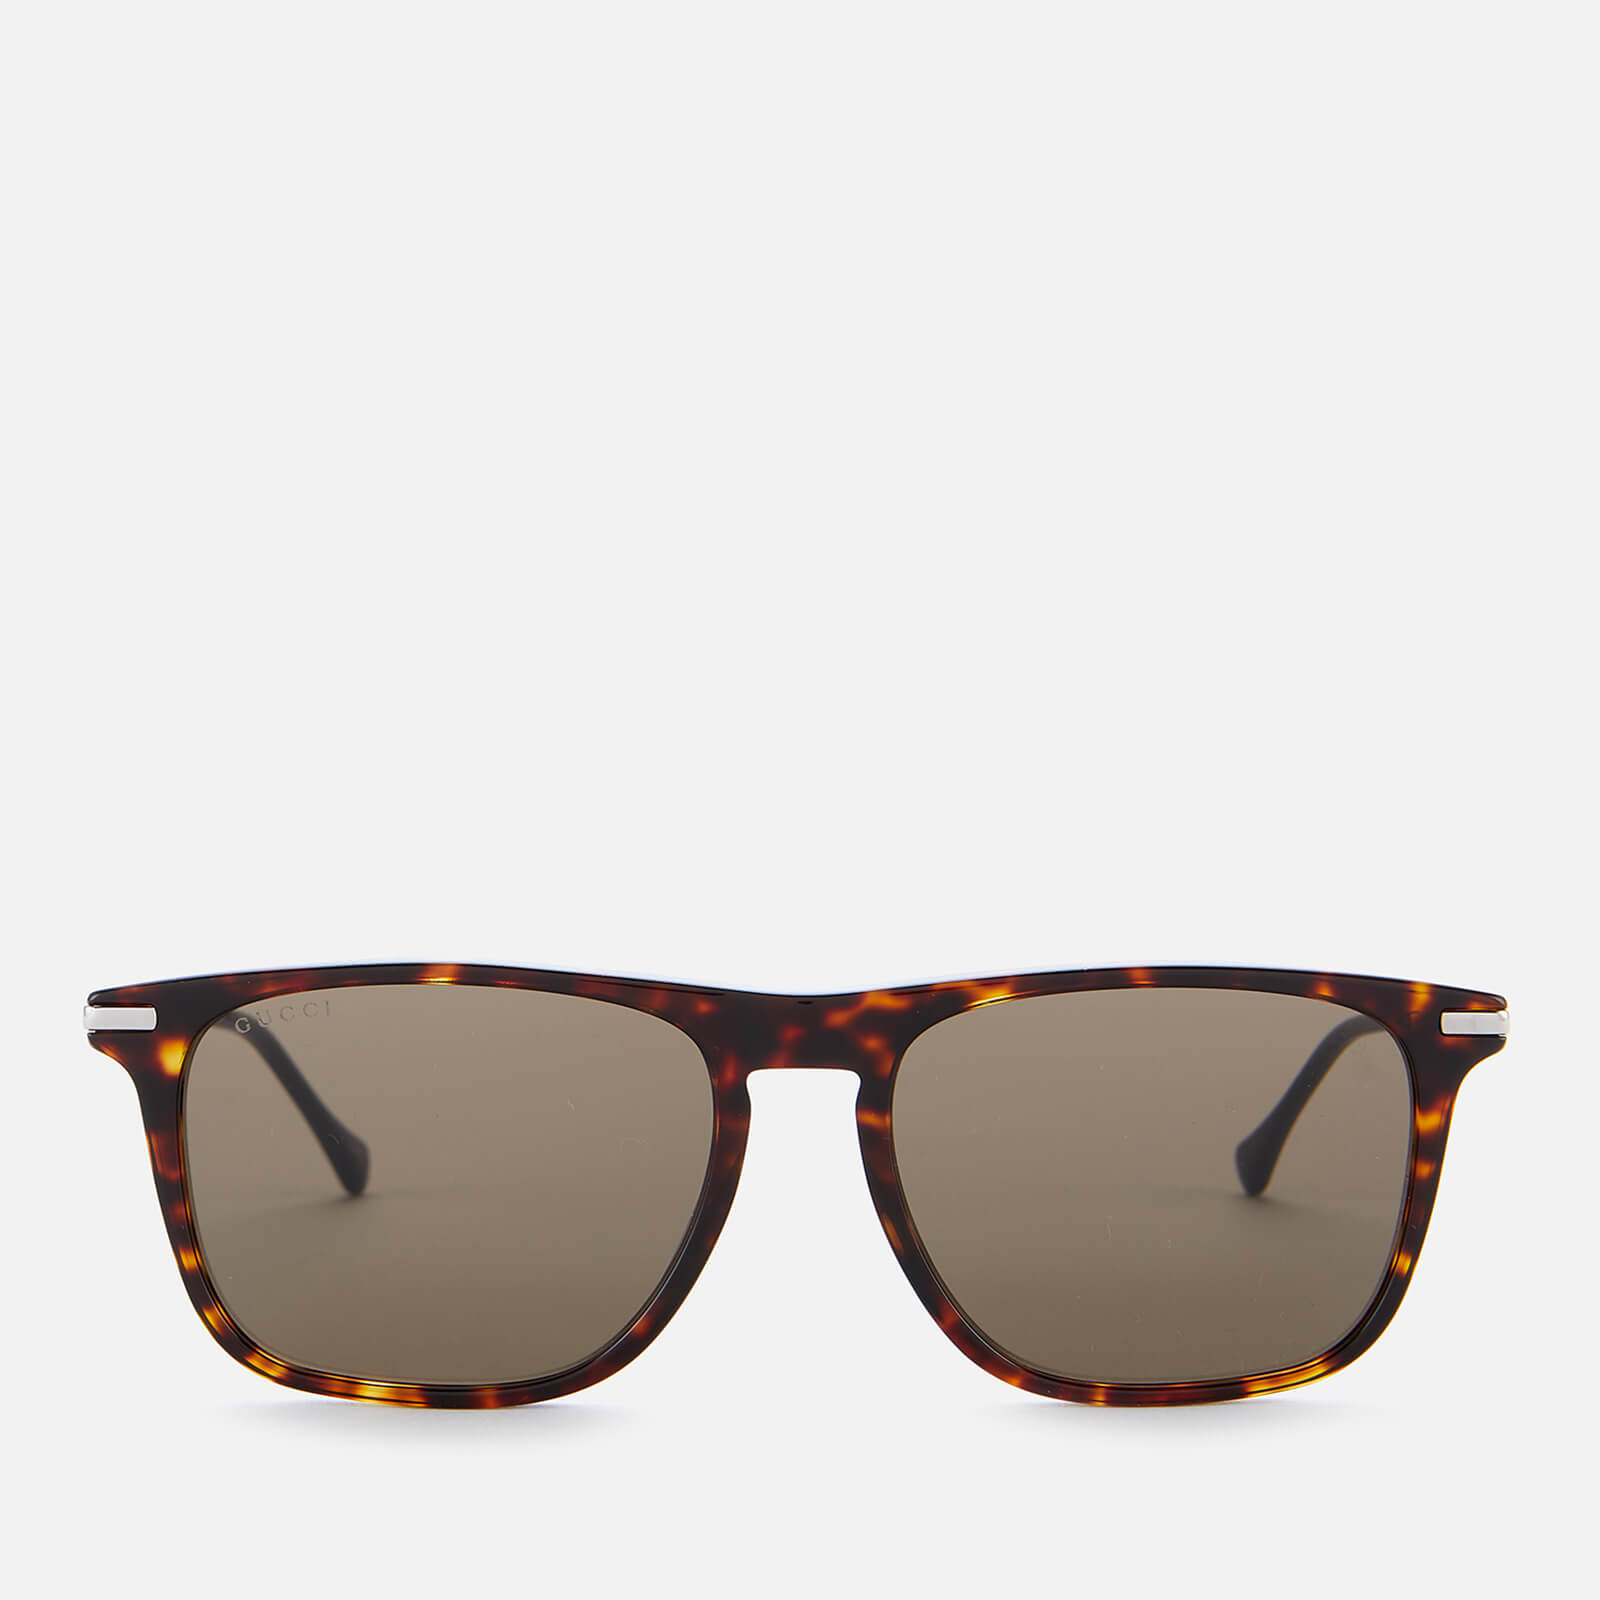 Gucci Men's Metal Sunglasses - Havana/Silver/Brown